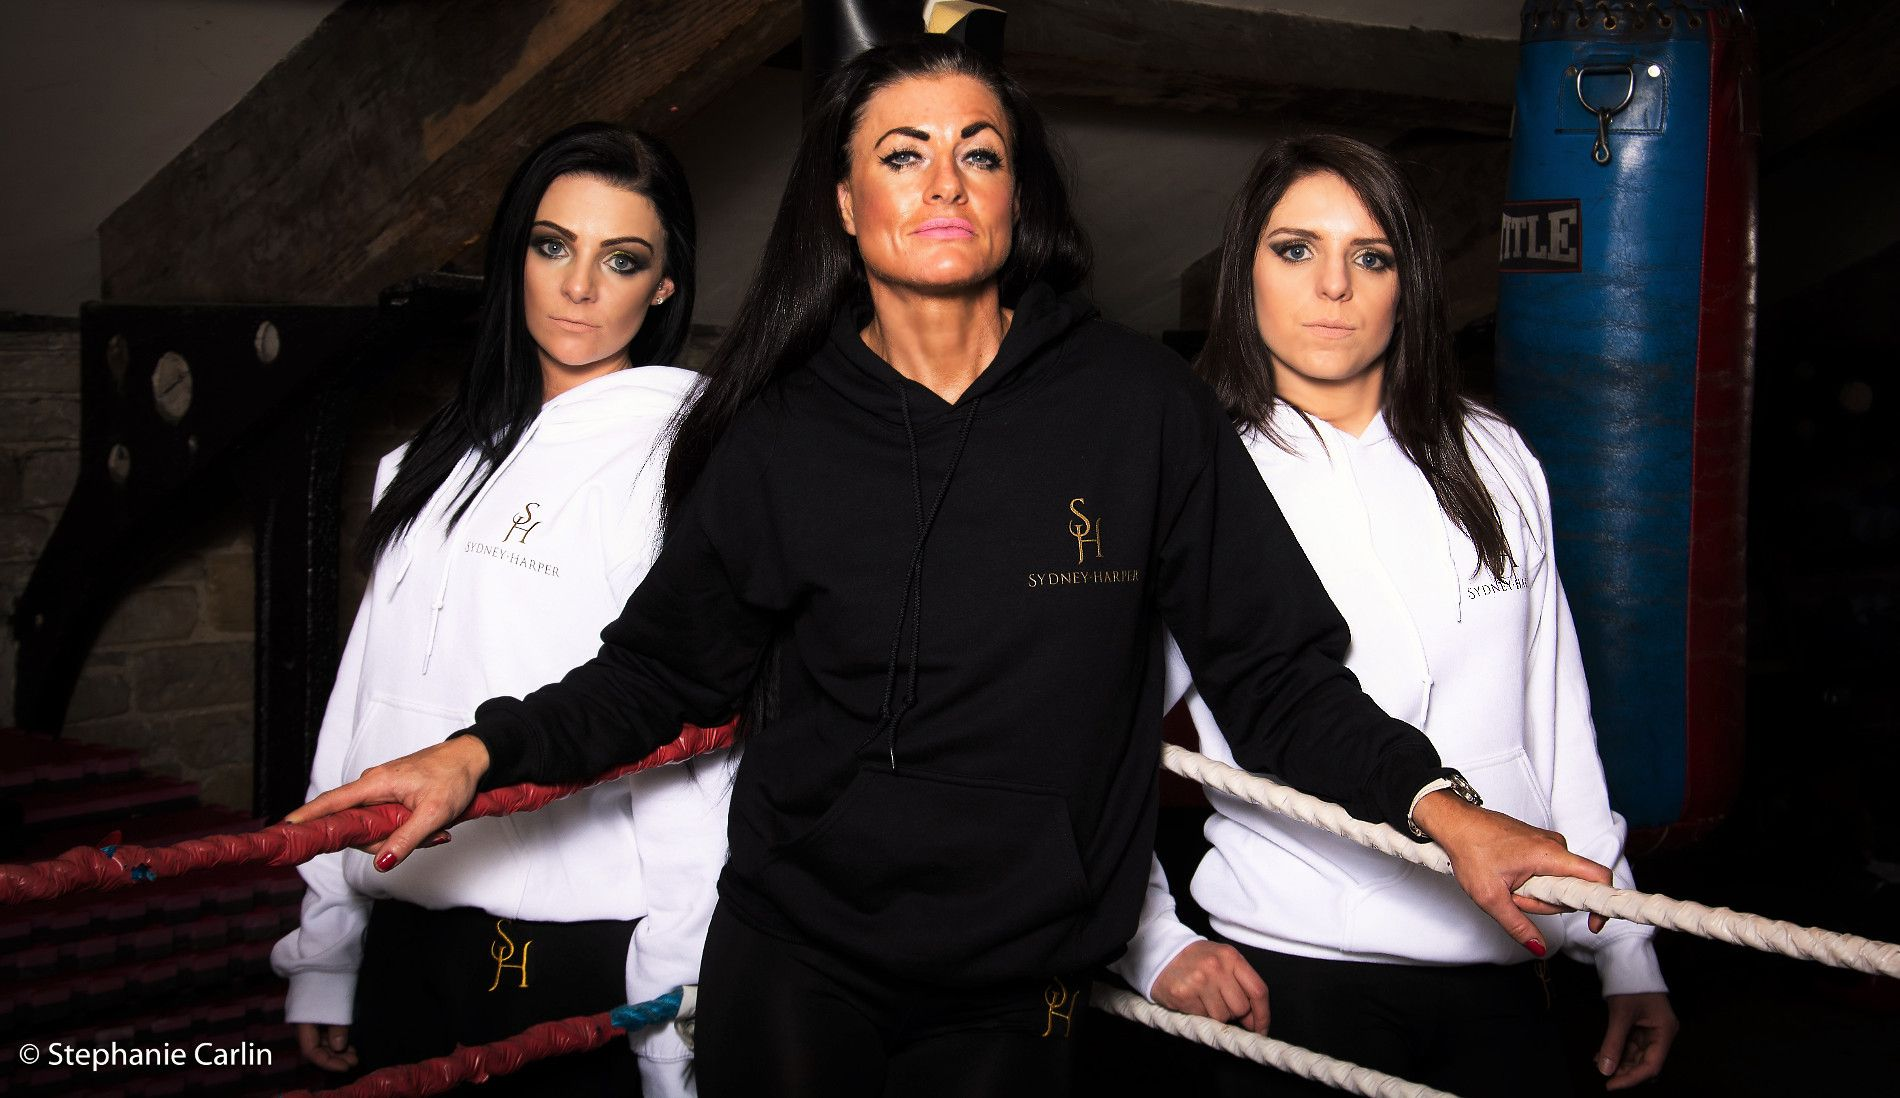 Models wear Black and White overhead hoodies.